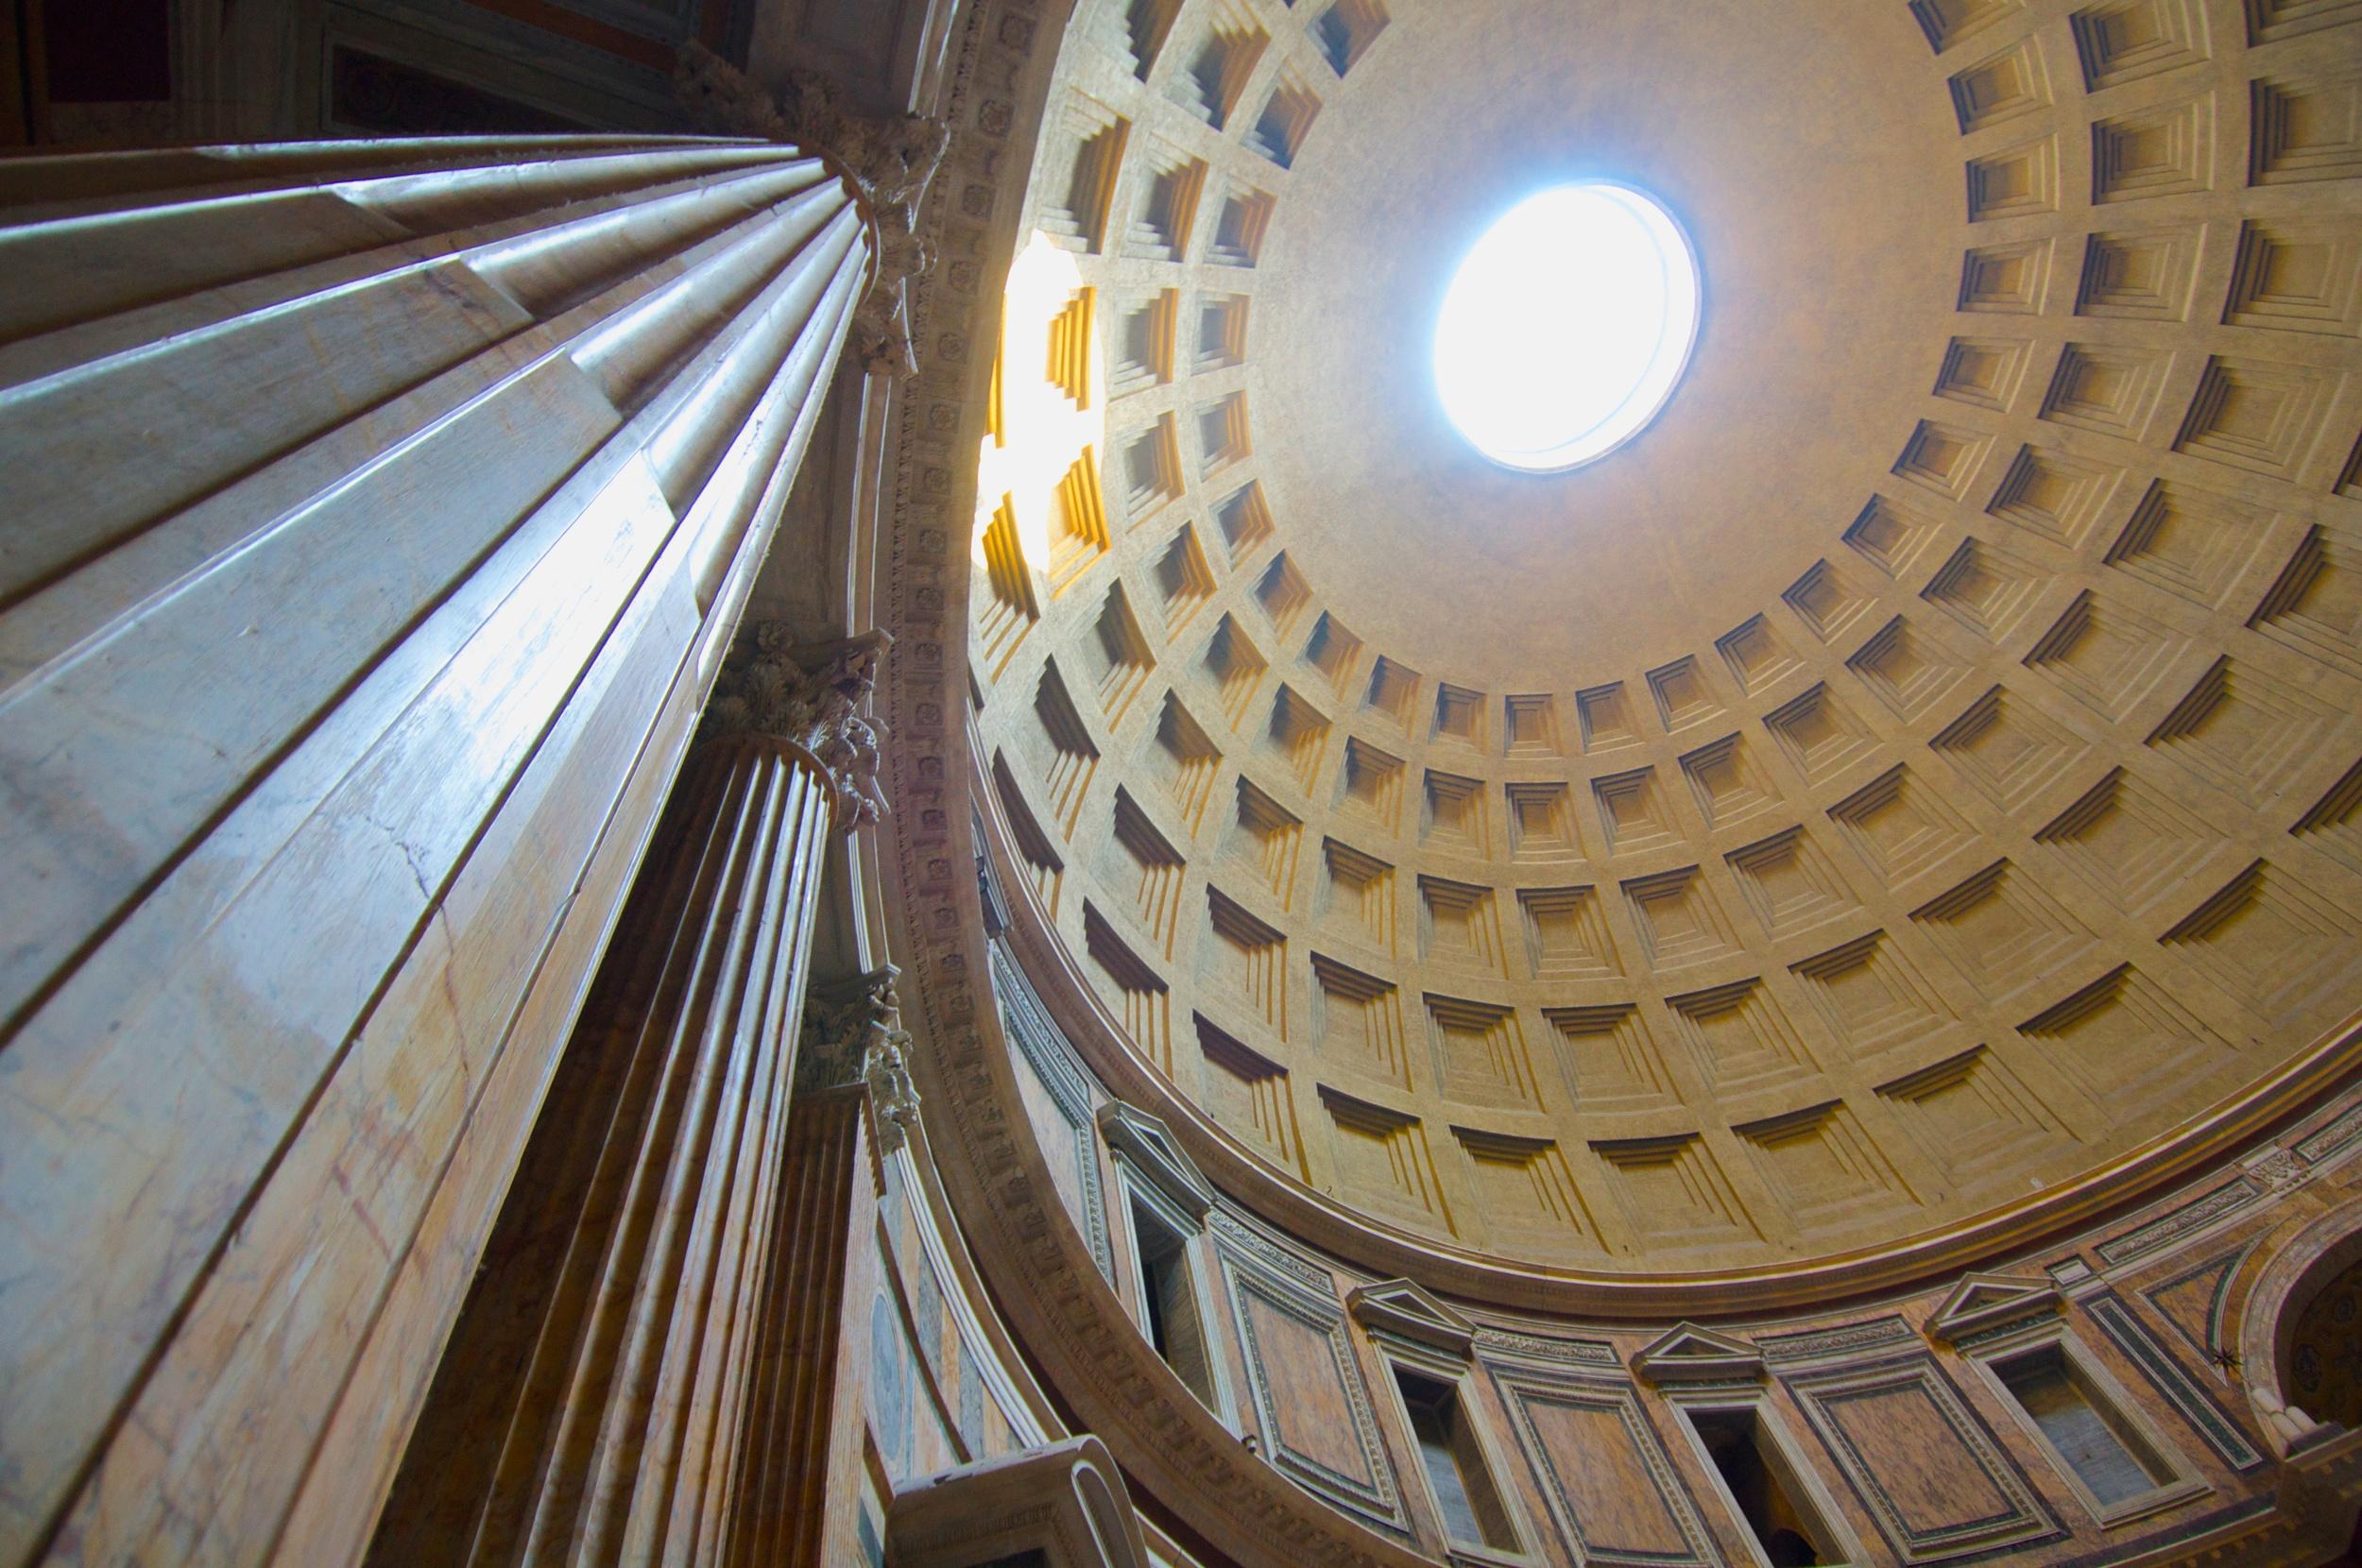 The Pantheon Interior & Oculus